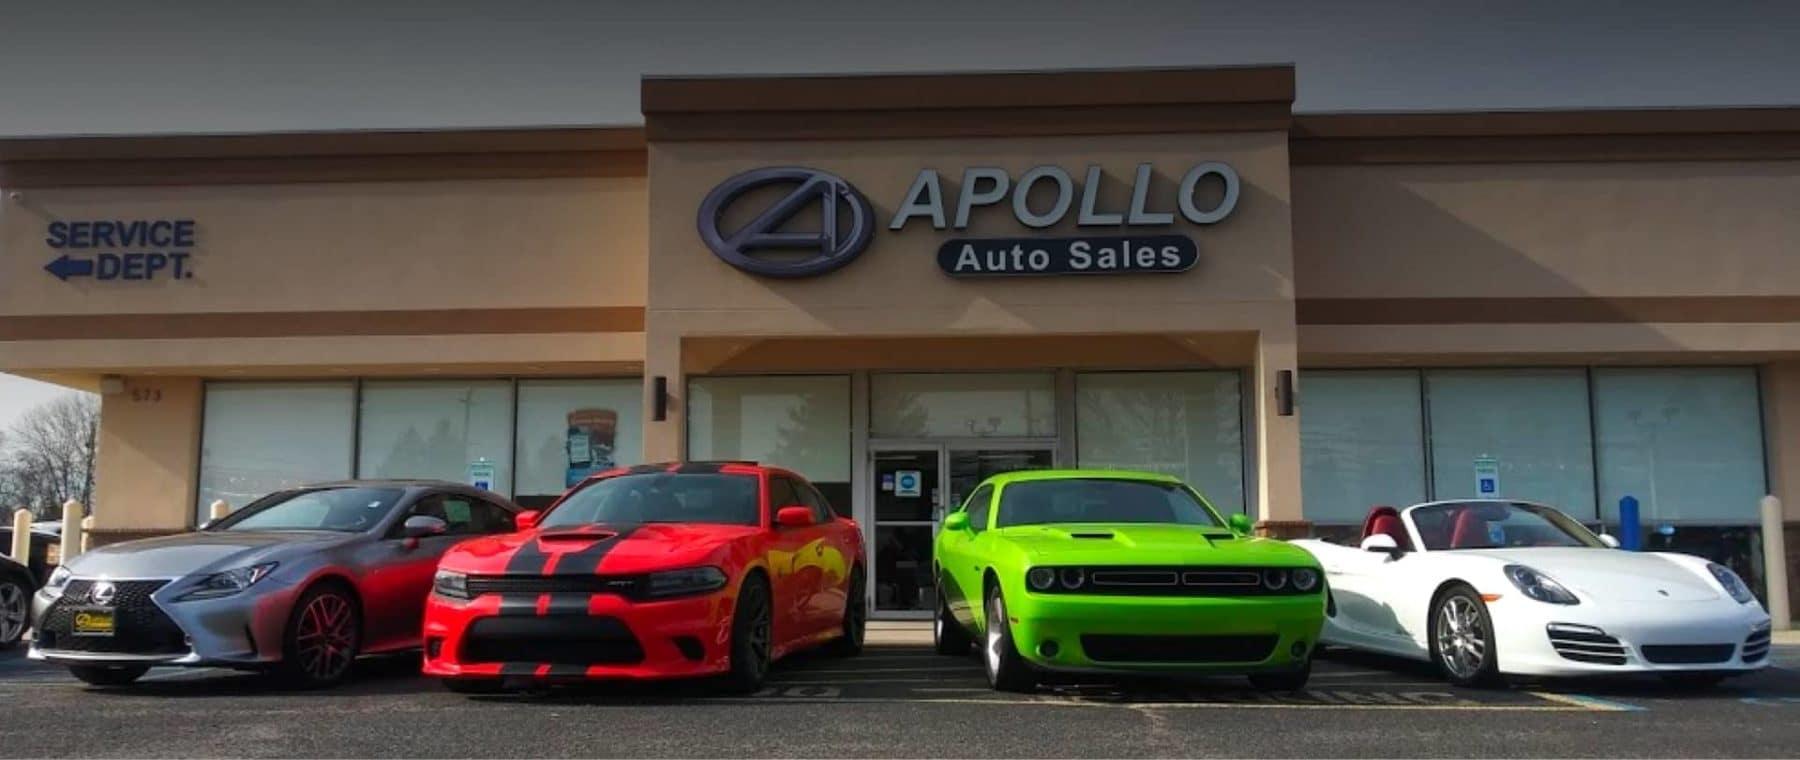 Apollo Auto Sales Dealership